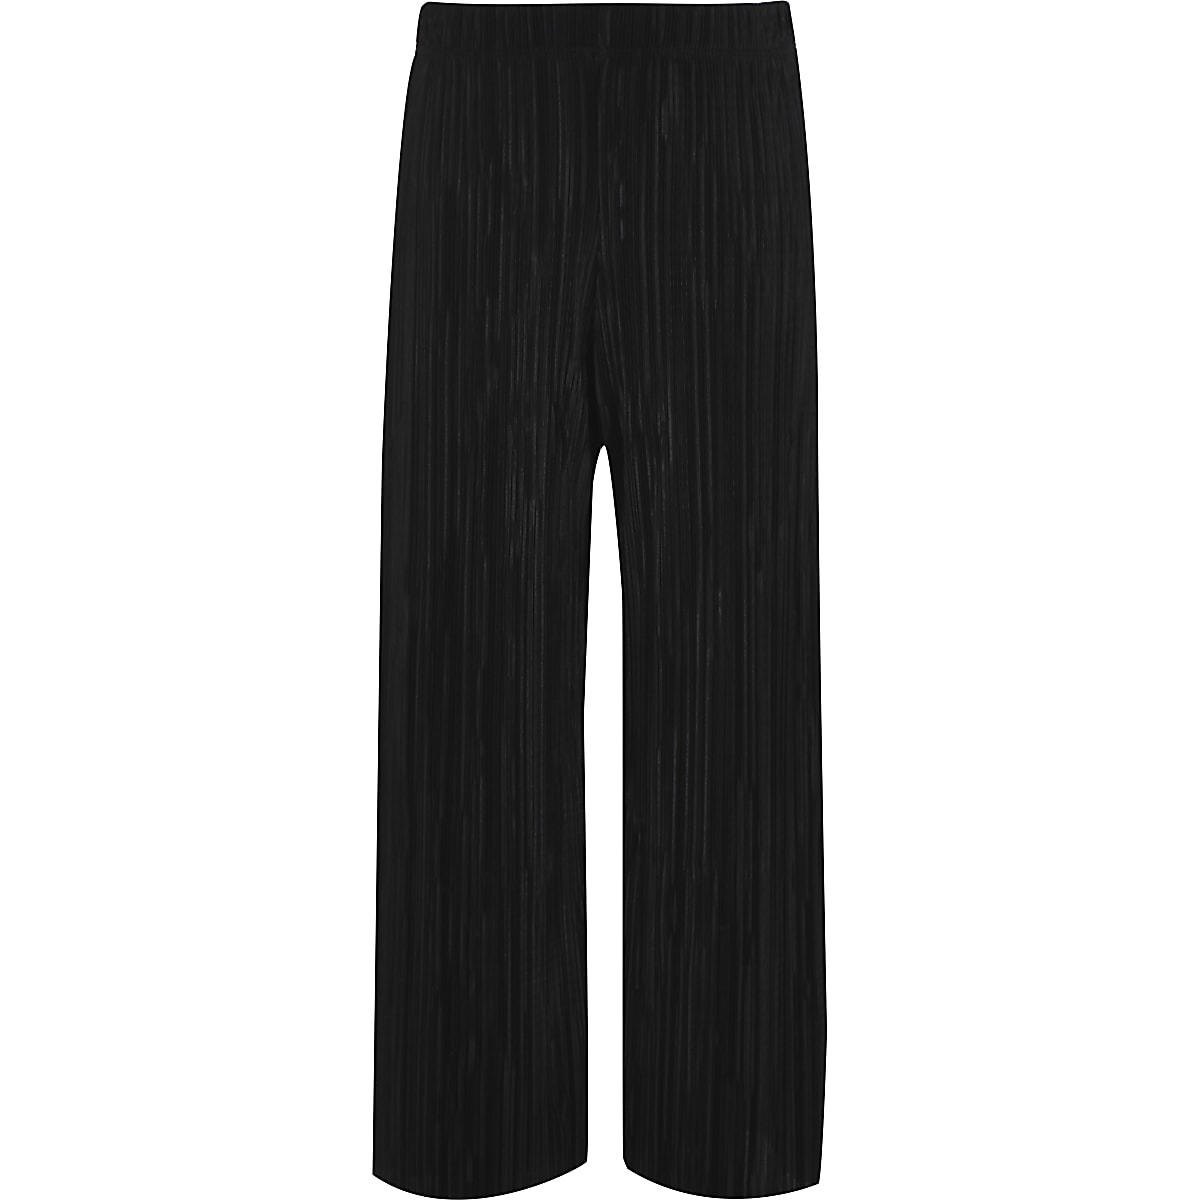 Girls black plisse wide leg trousers